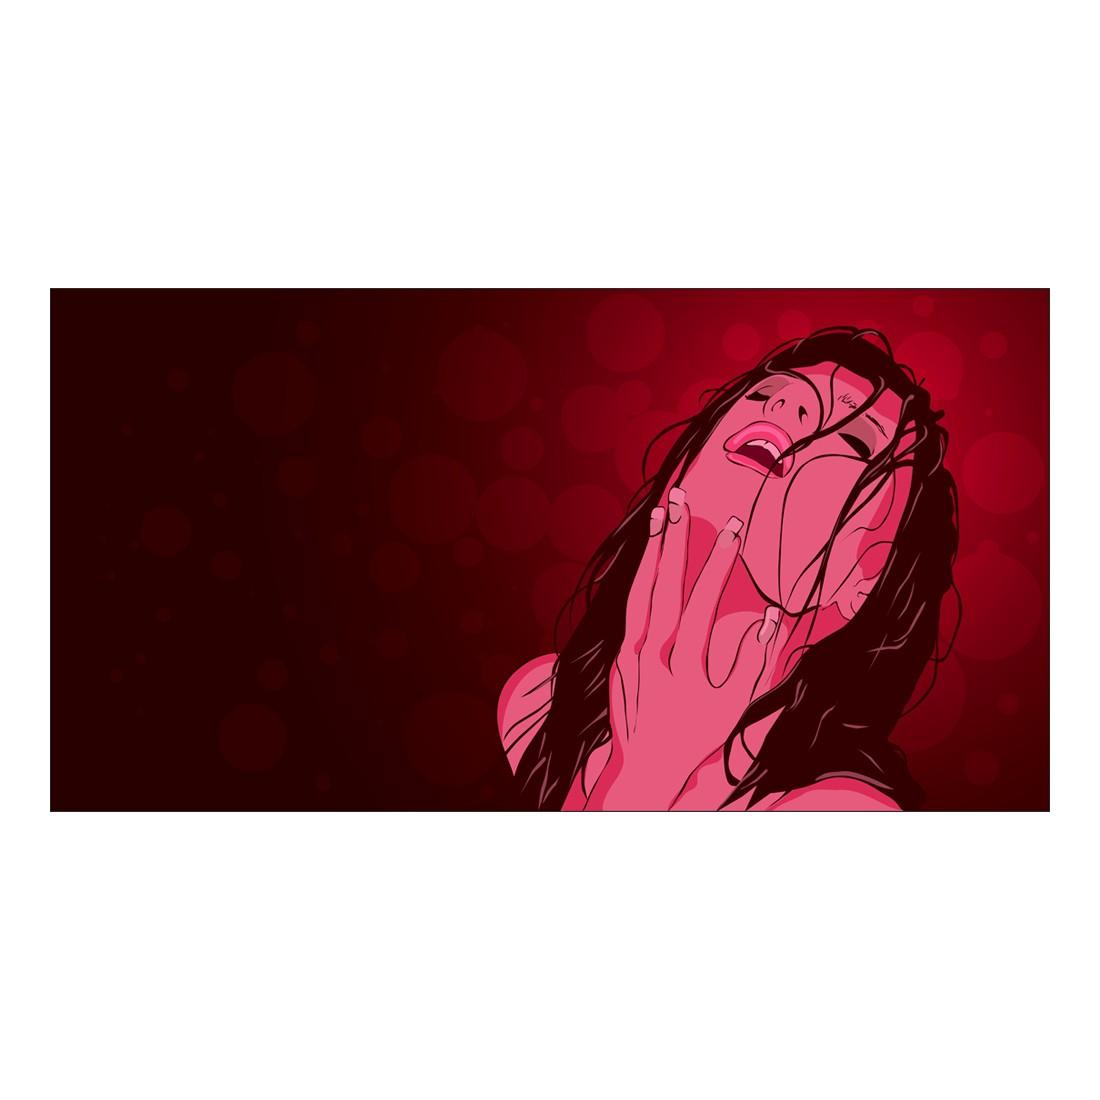 Leinwandbild Passion – 100 x 50cm, Gallery of Innovative Art günstig online kaufen